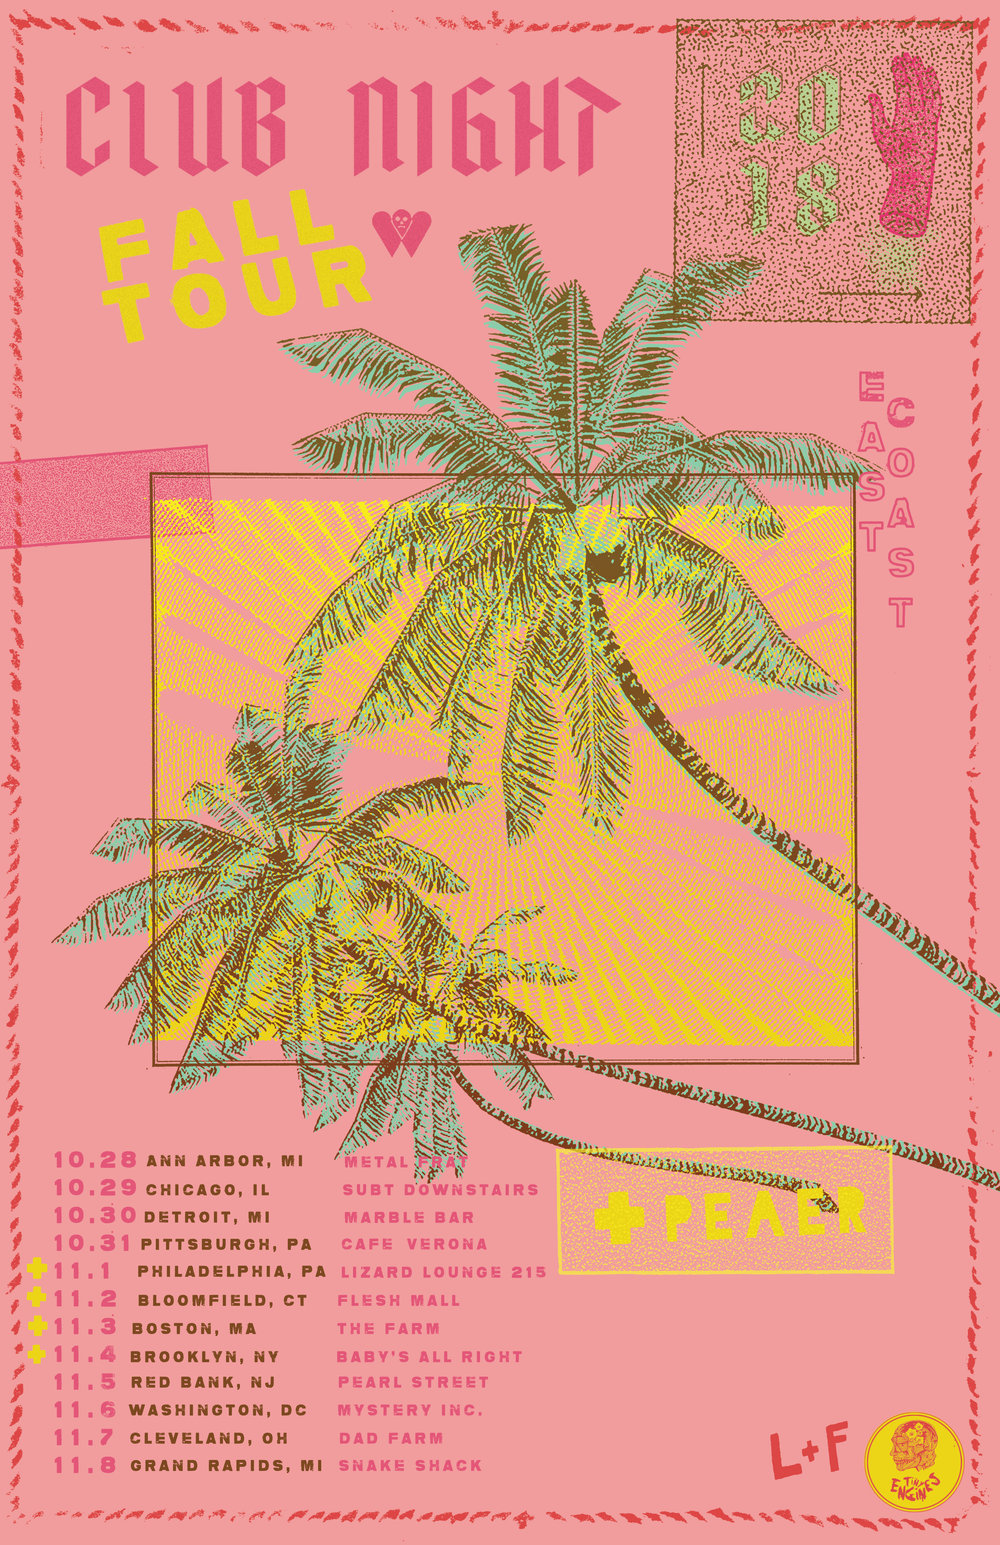 CN-Fall-Tour-Poster-1540225608.jpg